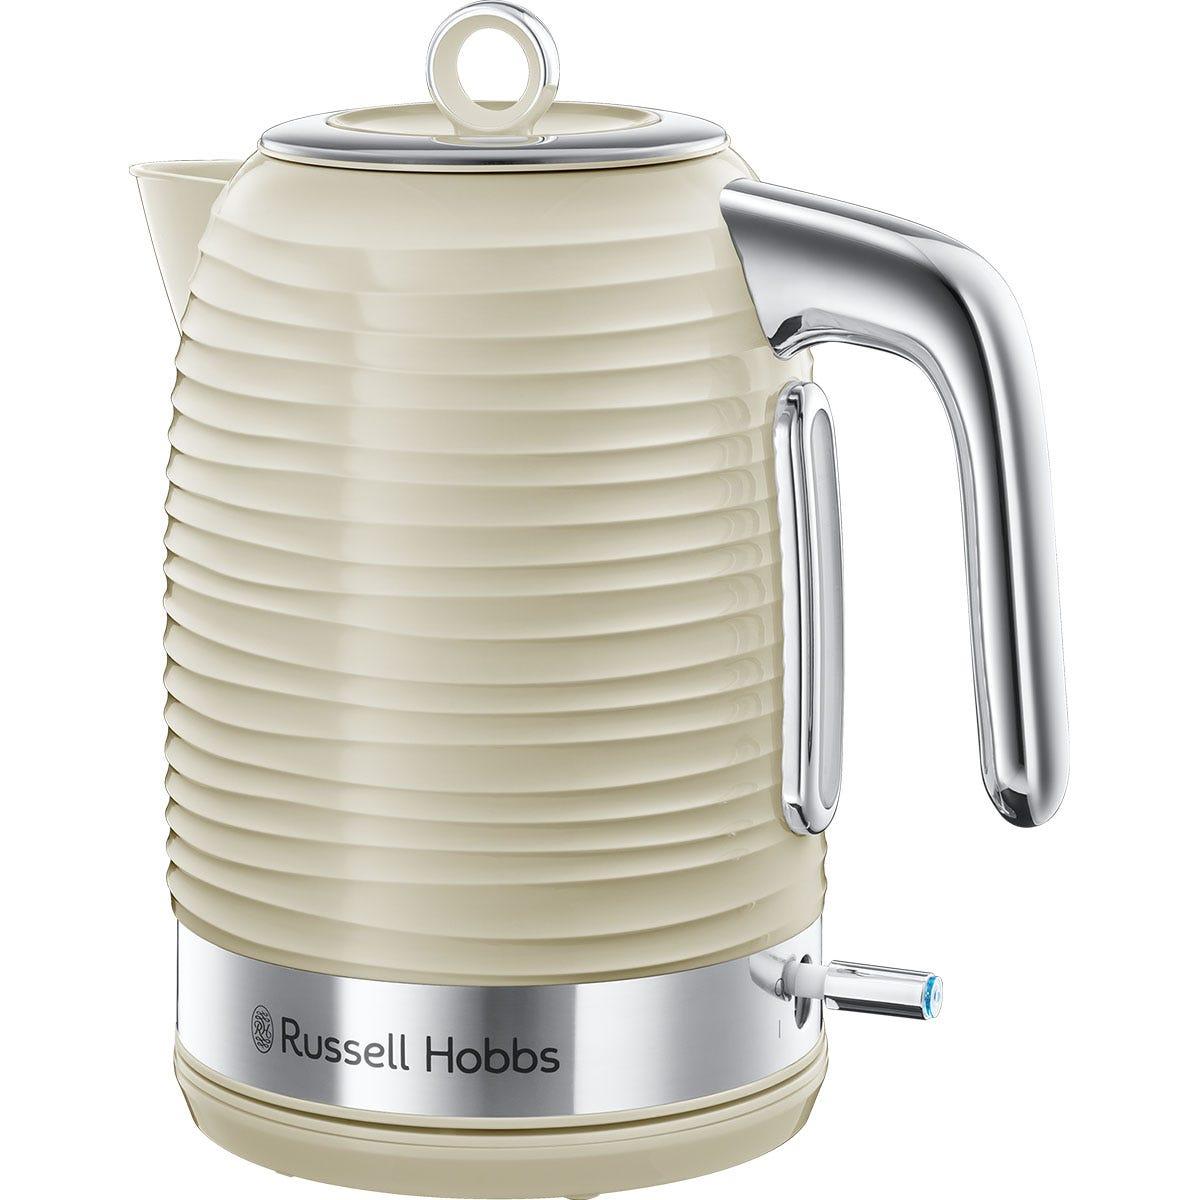 Russell Hobbs 24364 Inspire 3000W 1.7L Jug Kettle - Cream